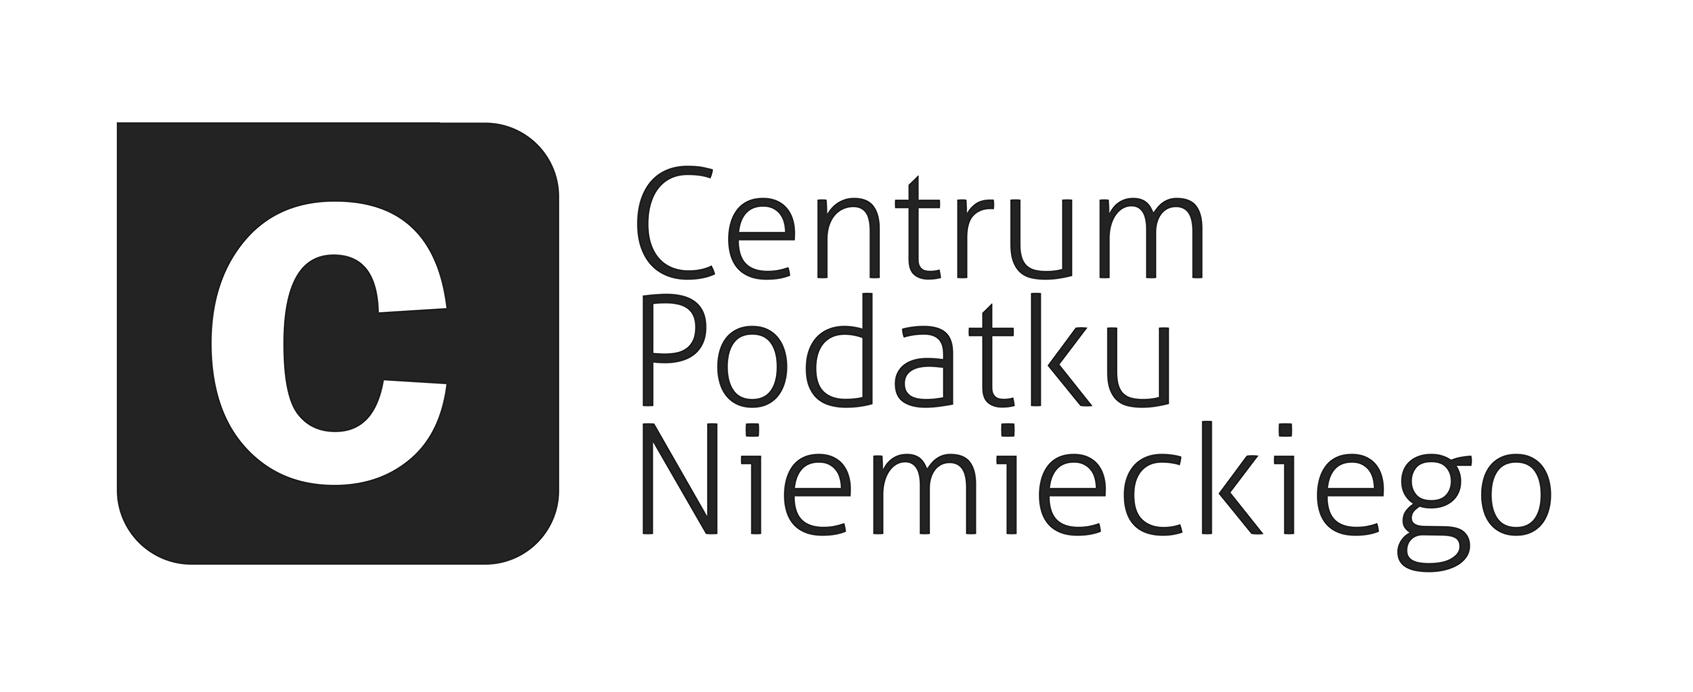 Centrum Podatku Niemieckiego